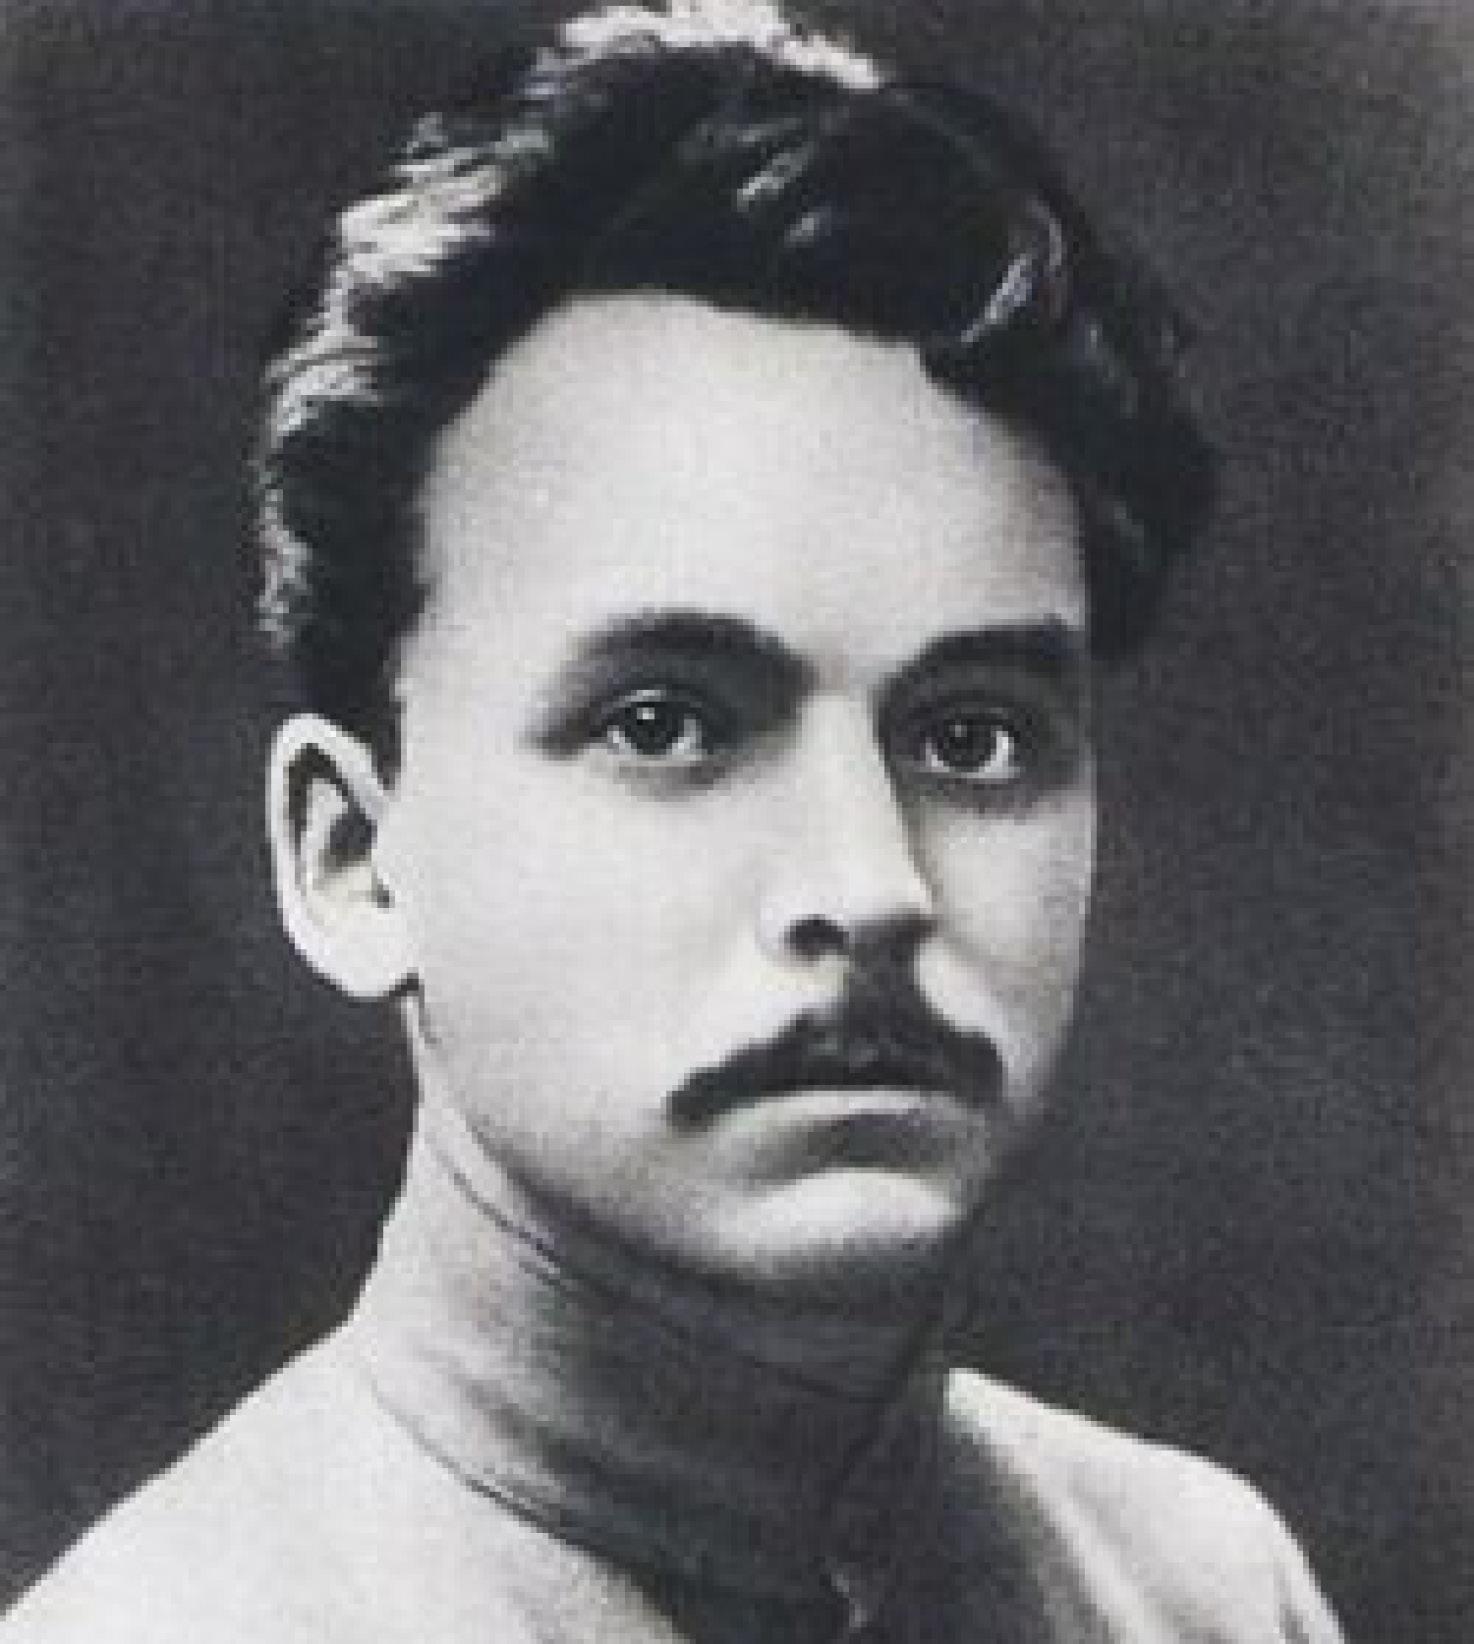 Dmitriy Furmanov